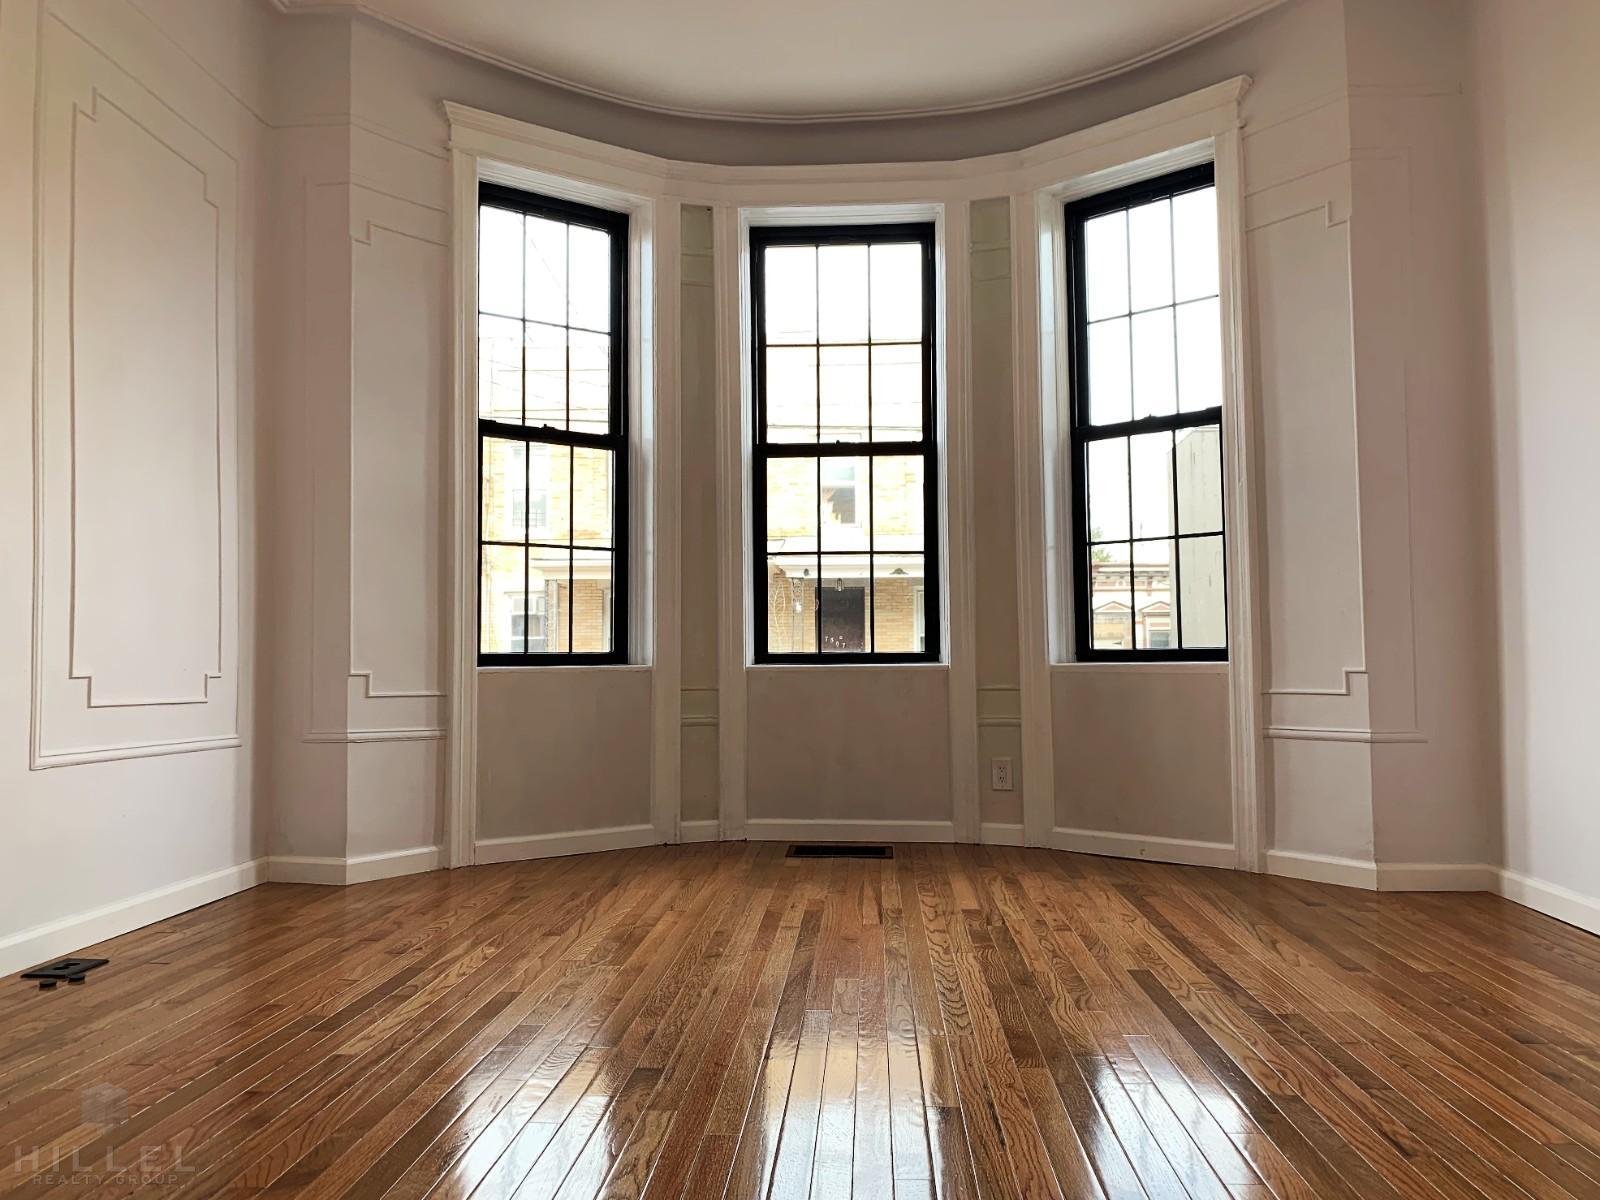 7508 62nd Street, #1B, RIDGEWOOD, NY 11385 | Ridgewood Apartments